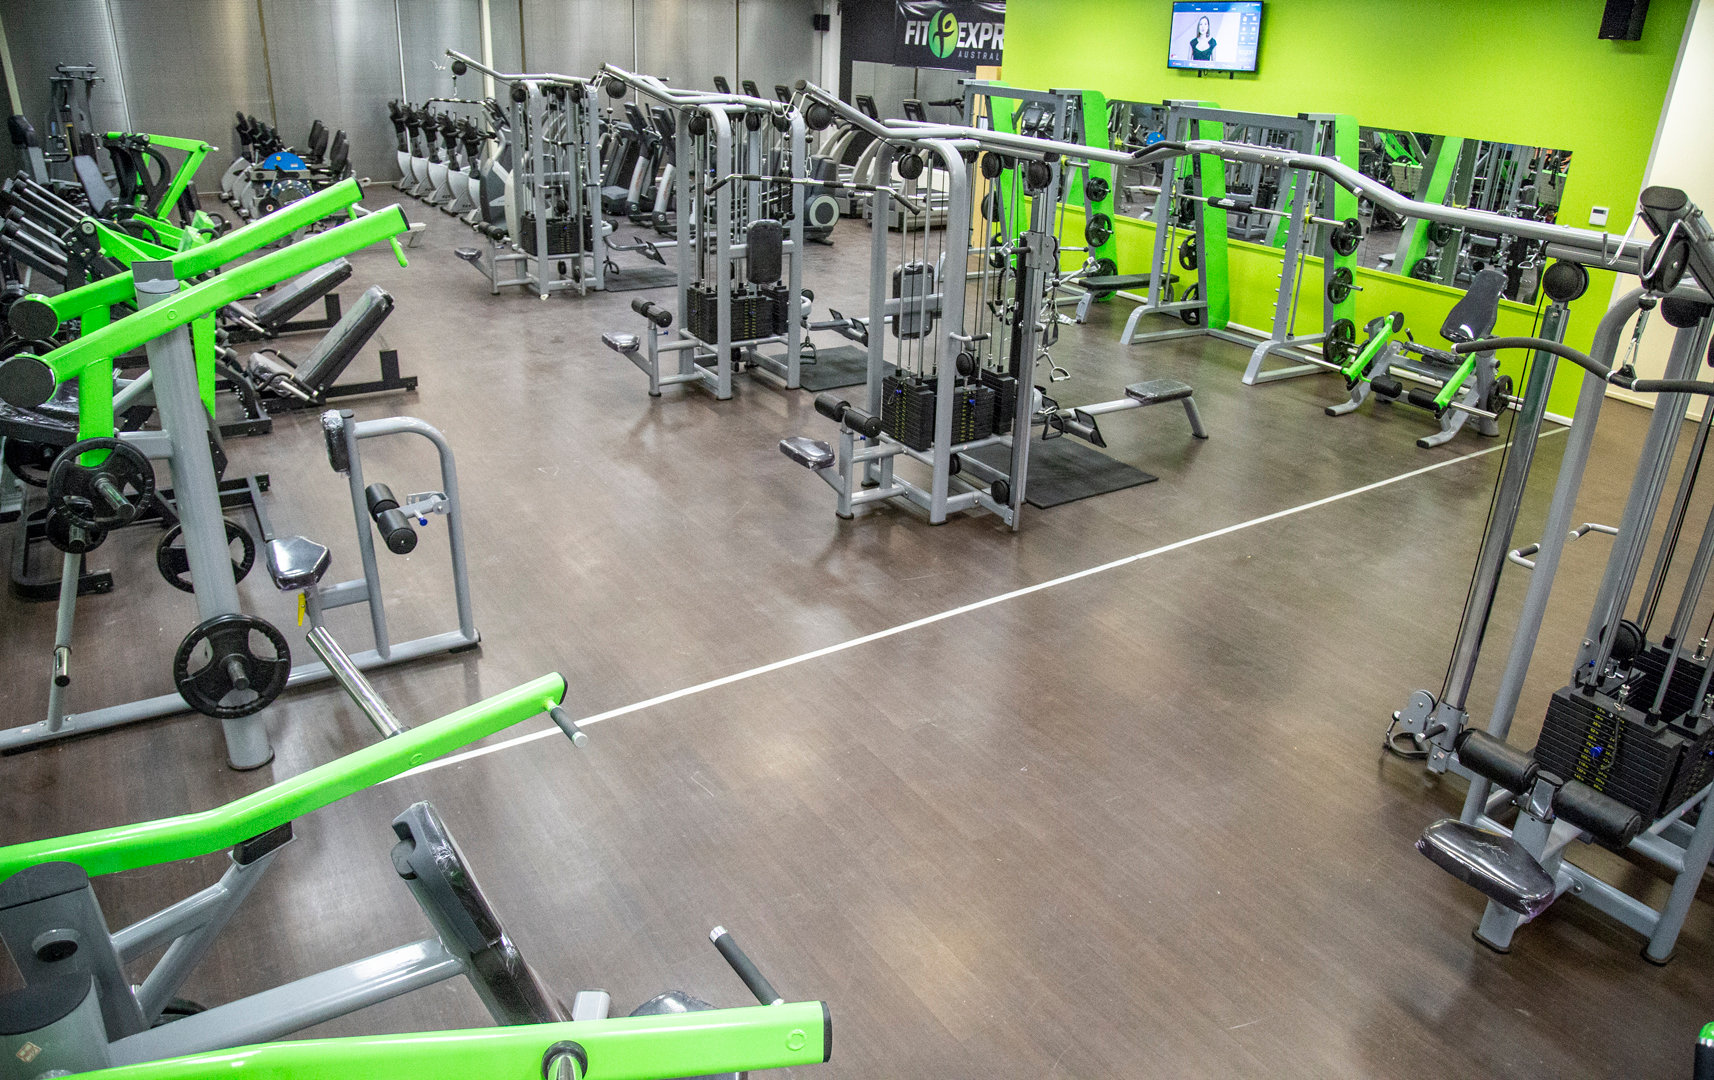 Casual Workout RESERVOIR